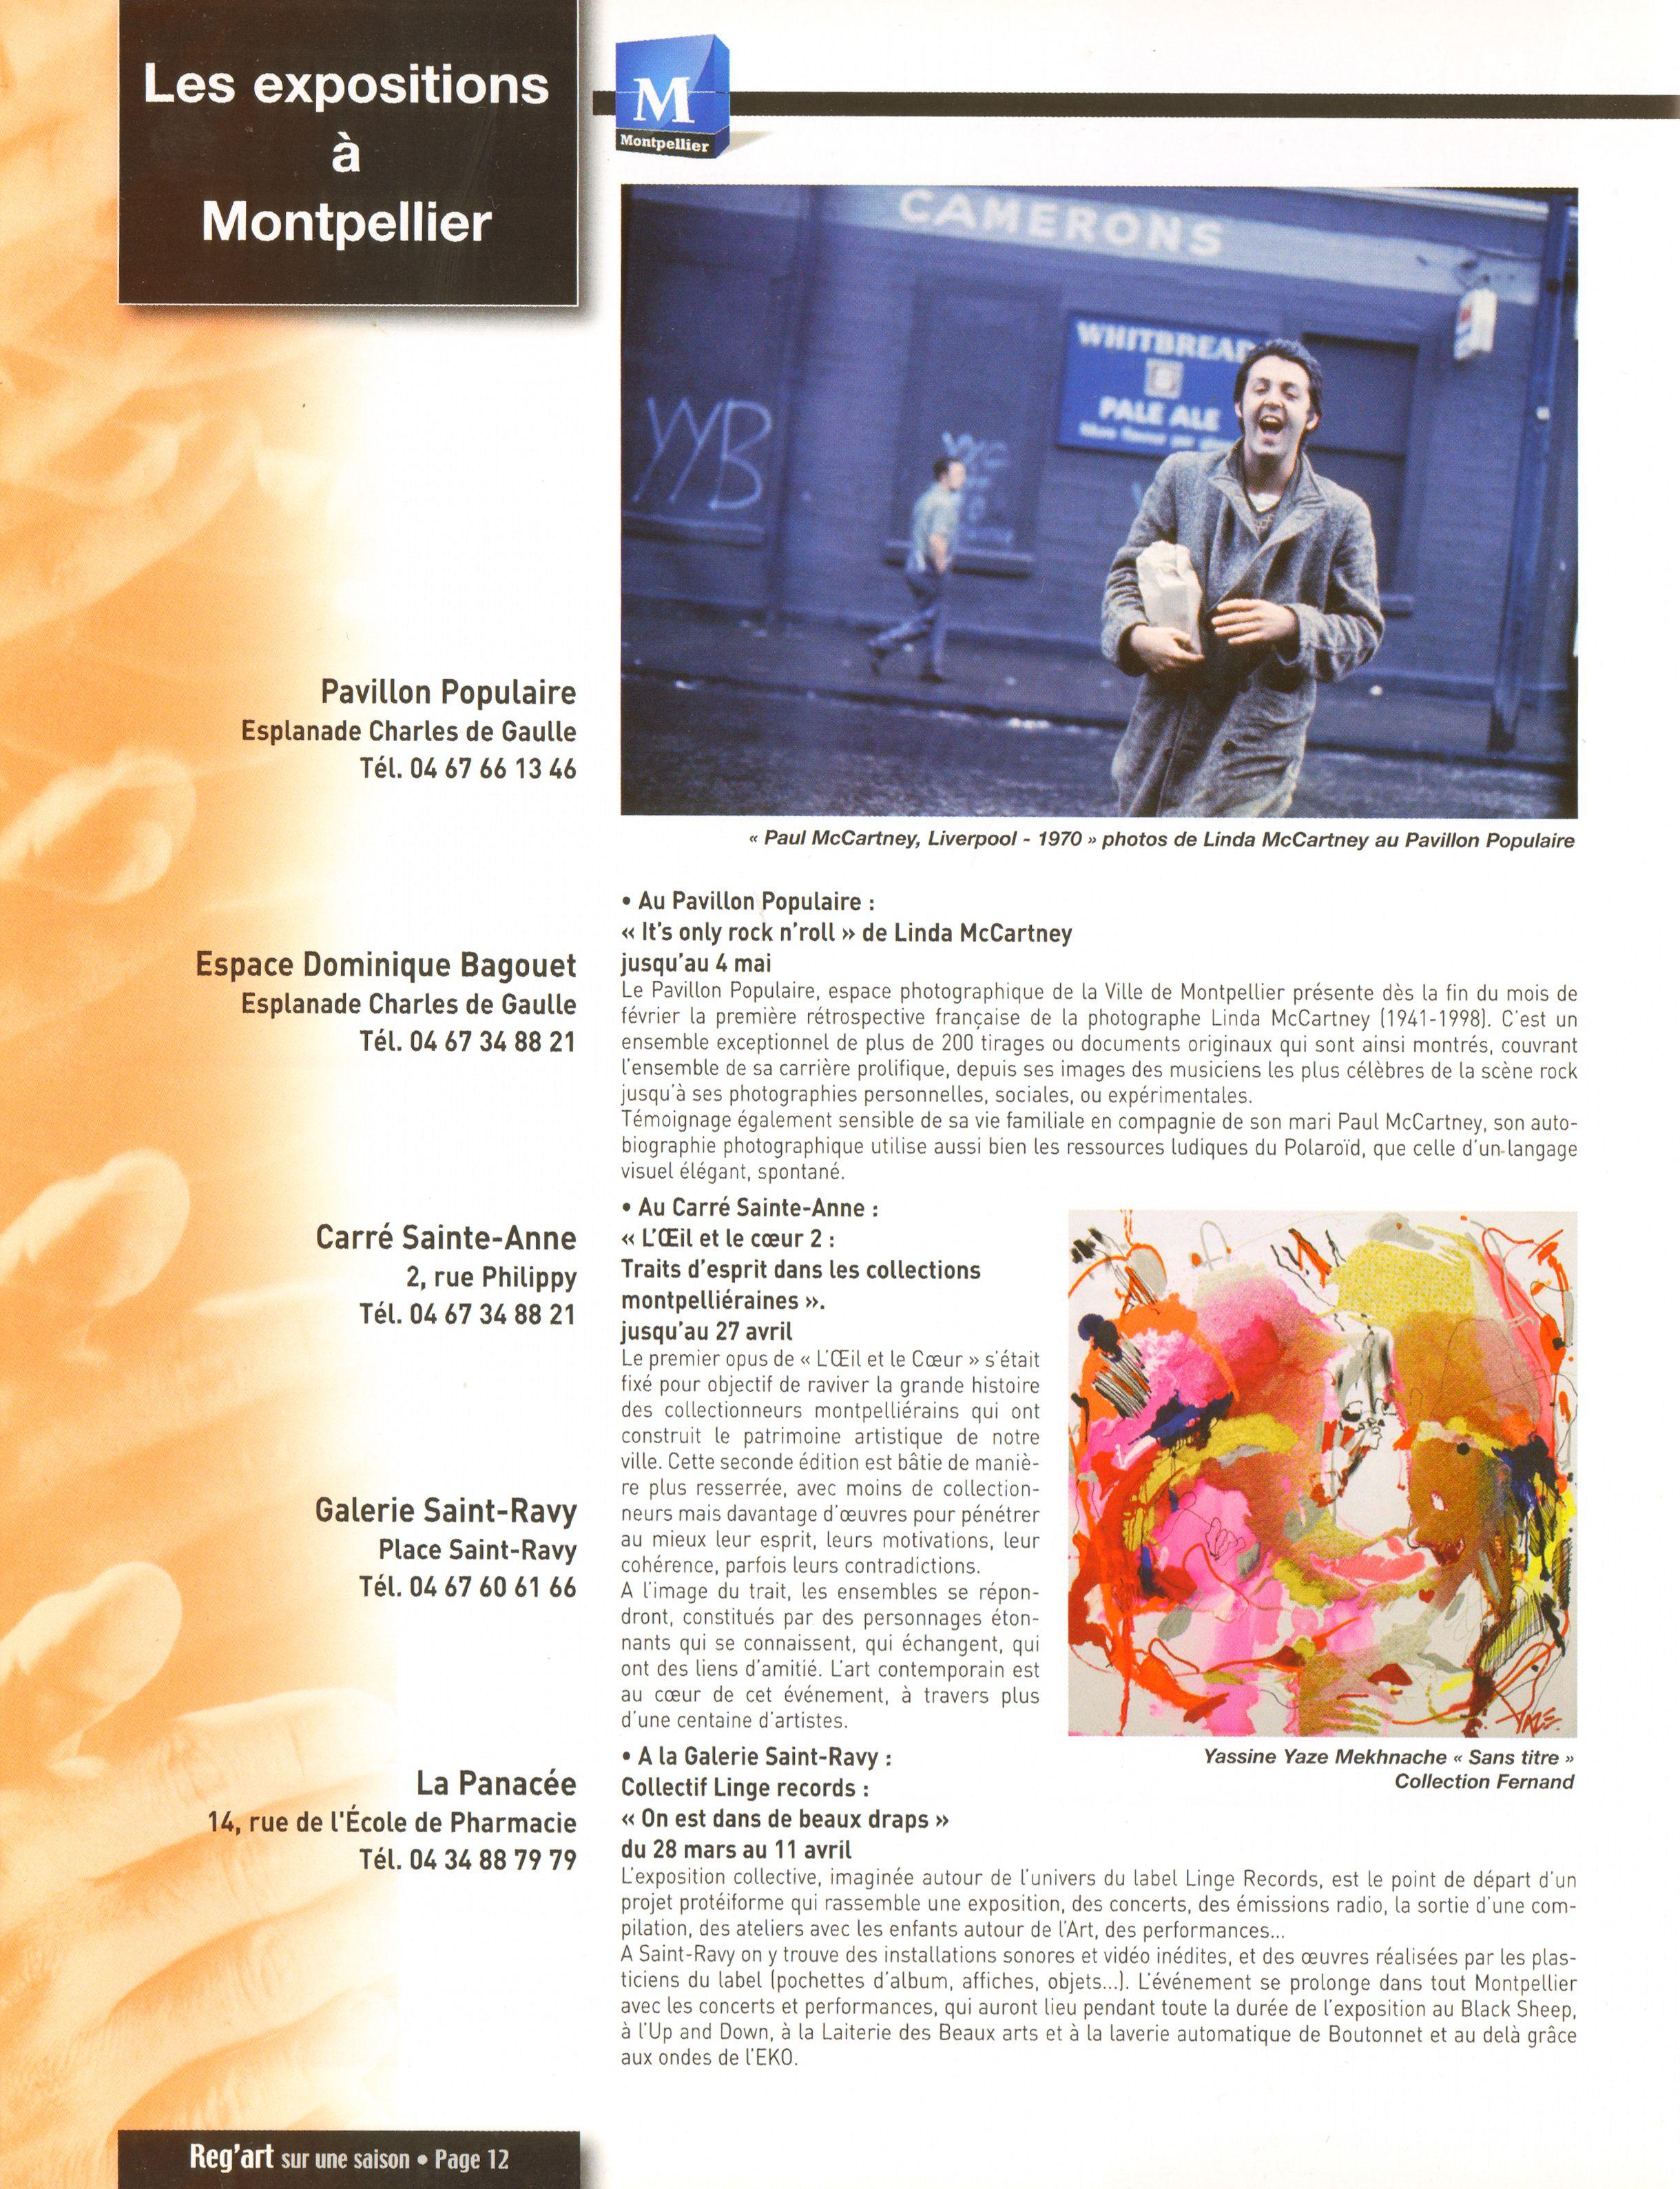 Magazines Français 1989 - 2014 RegArtMarsAvrilMai2014Page12